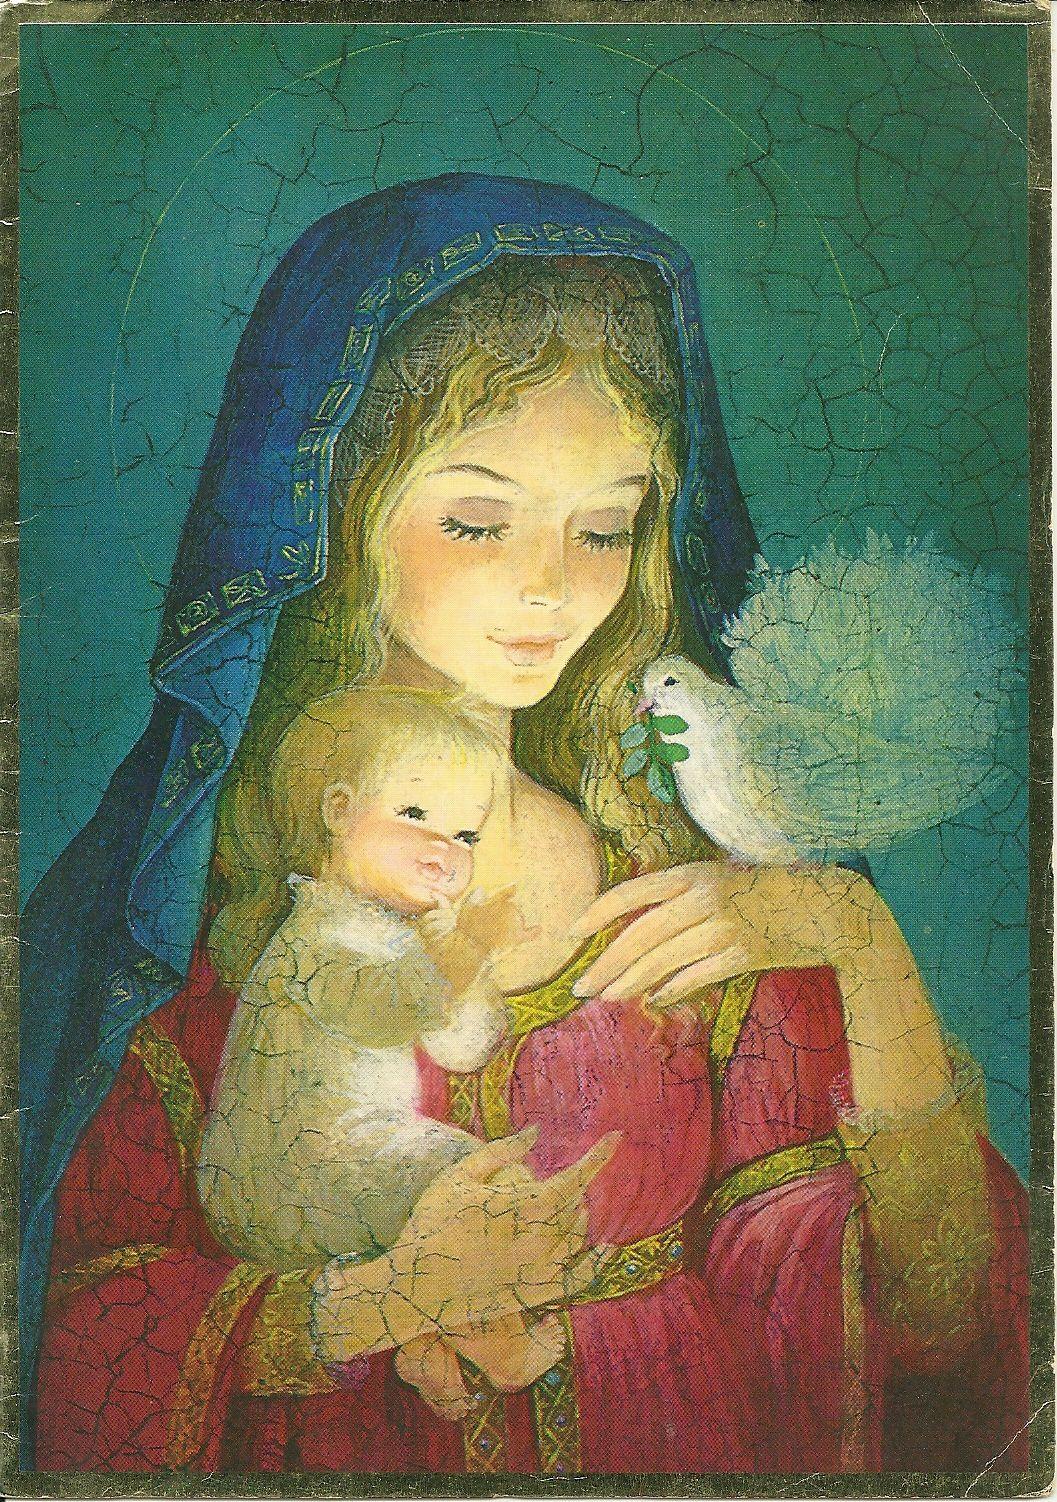 Nossa Senhora De Guadalupe Wallpaper Vintage Natal Carto